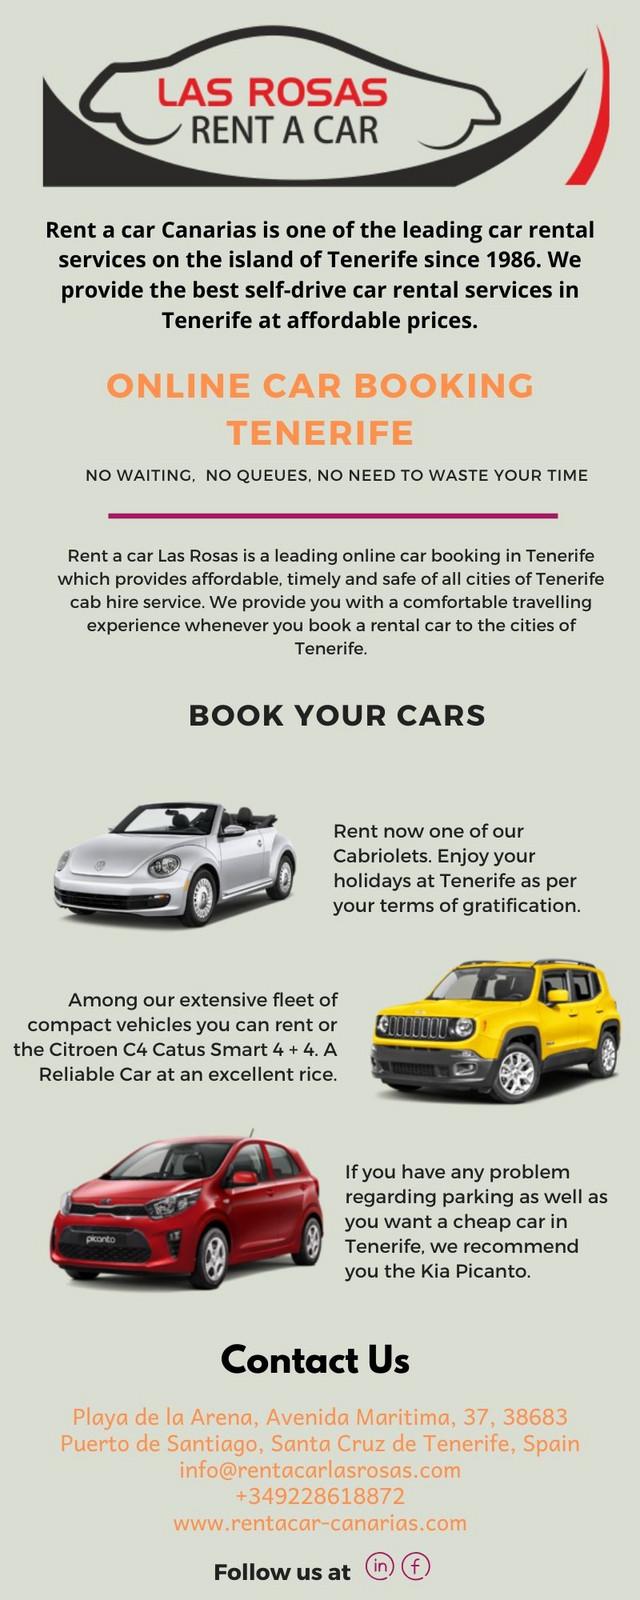 Online car booking Tenerife